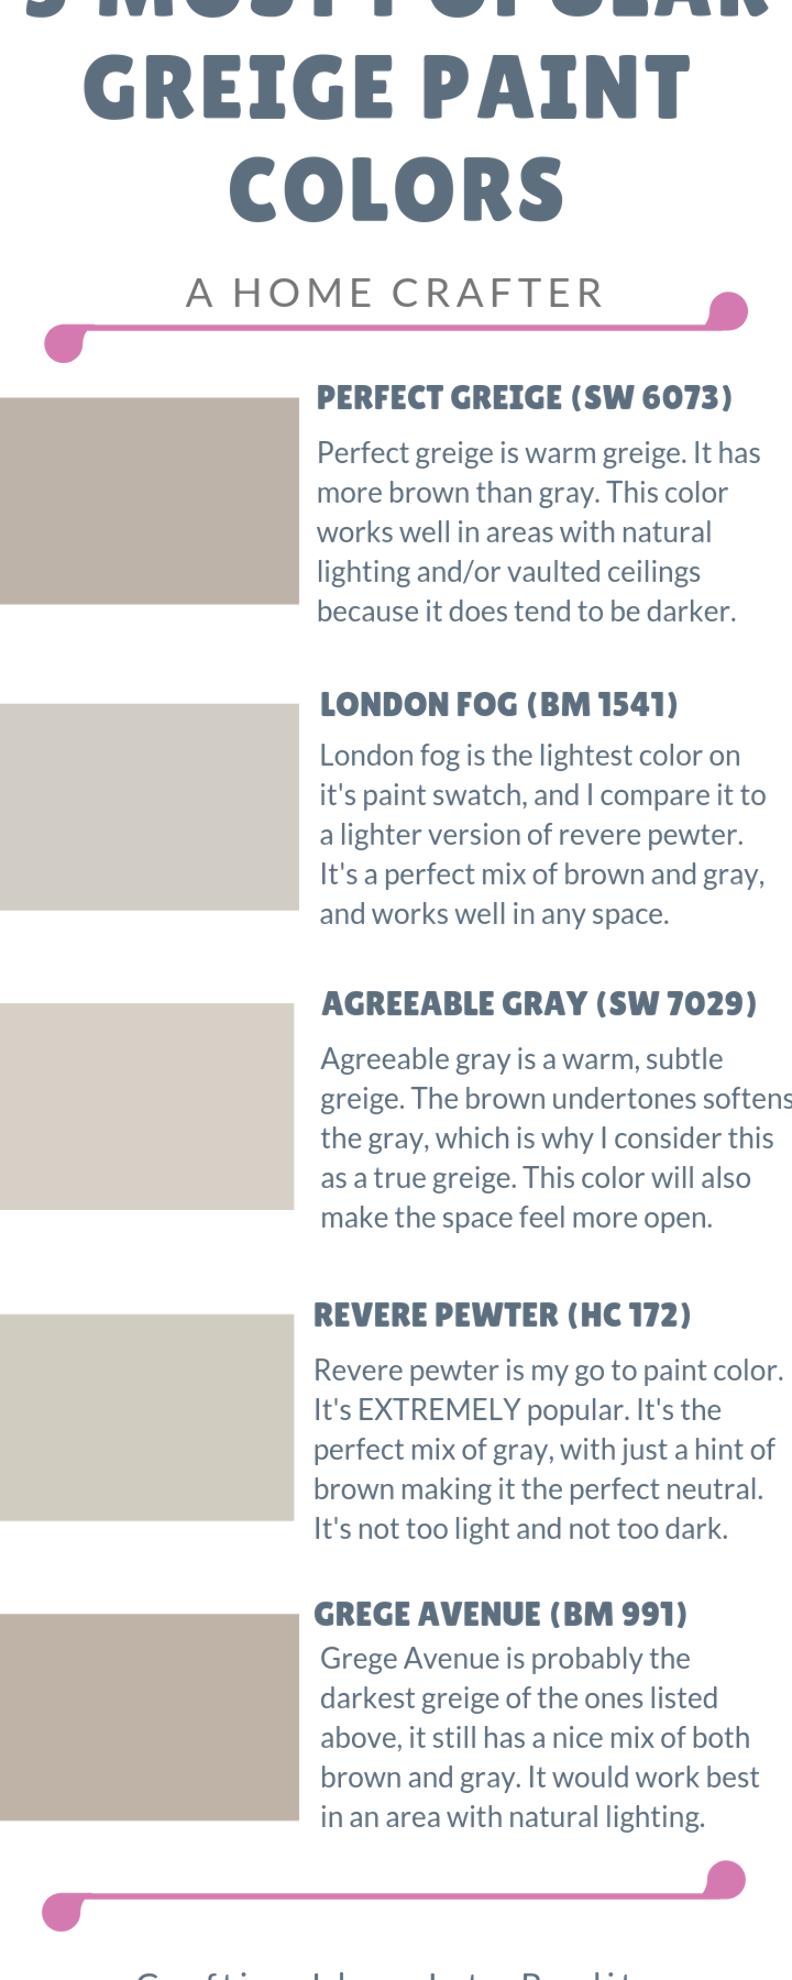 Gray Beige Greige Perfect Greige London Fog Agreeable Gray Revere Pewter Grege Avenue Be In 2020 Benjamin Moore London Fog Greige Paint Colors Natural Light